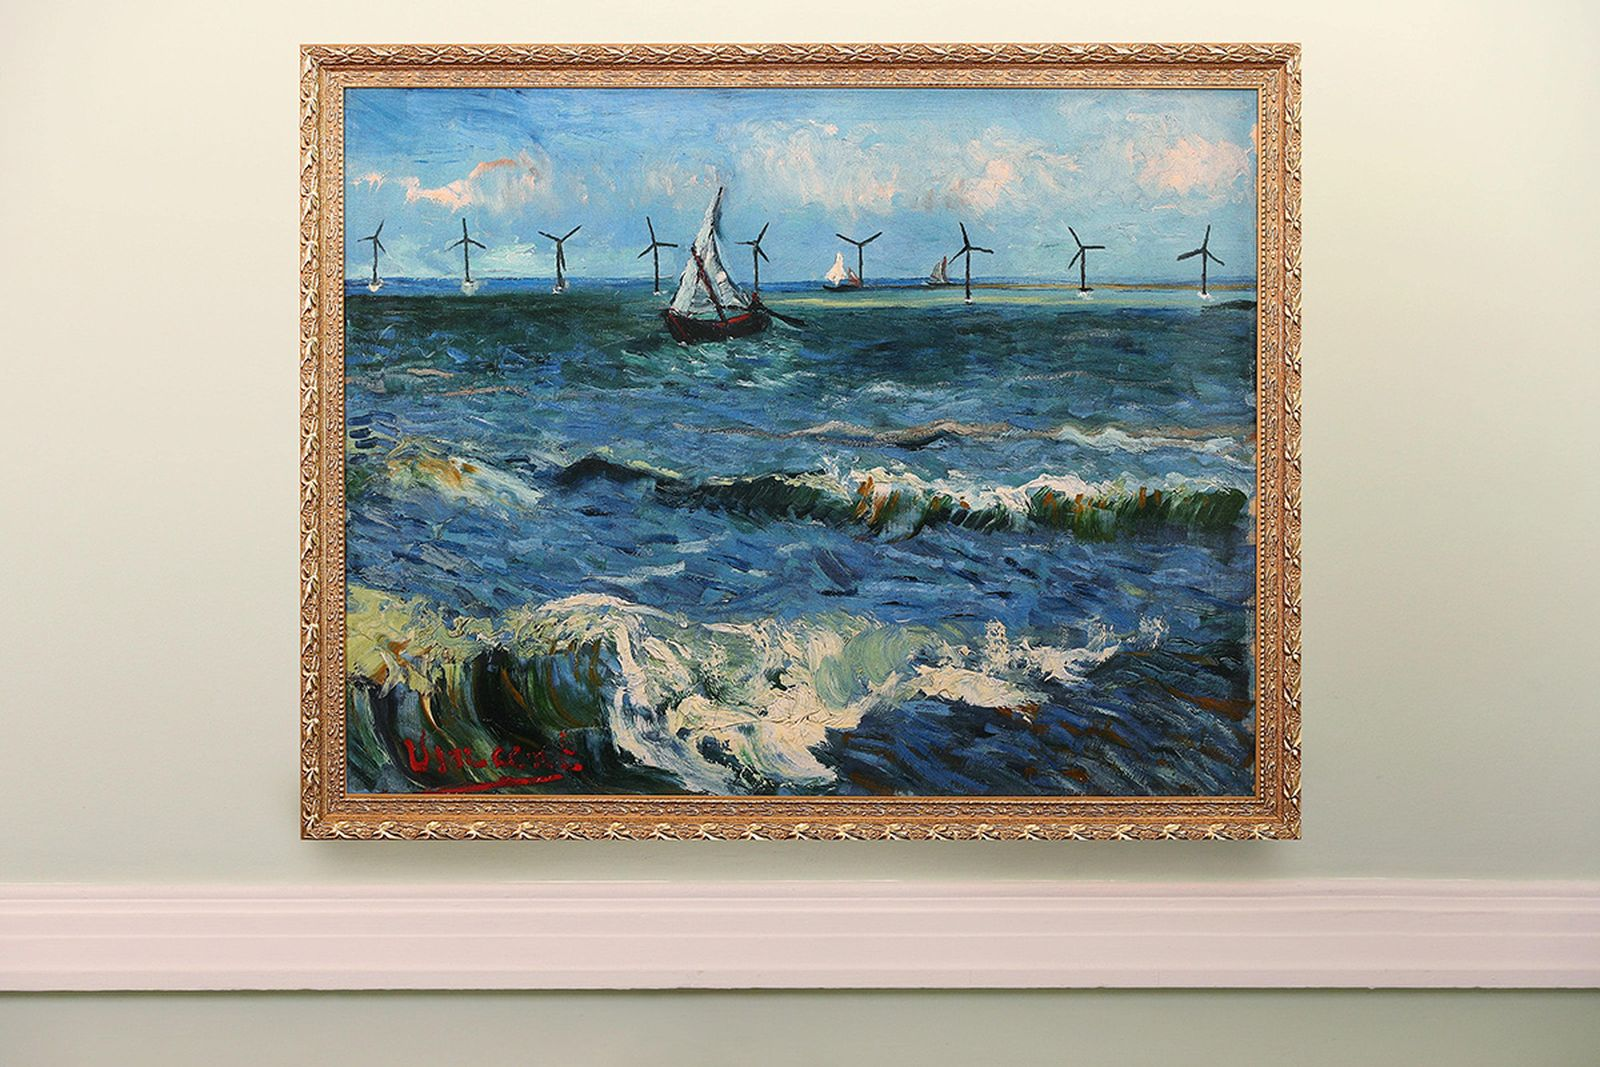 reuben-dangoor-taps-the-great-masters-to-imagine-future-seascapes-08